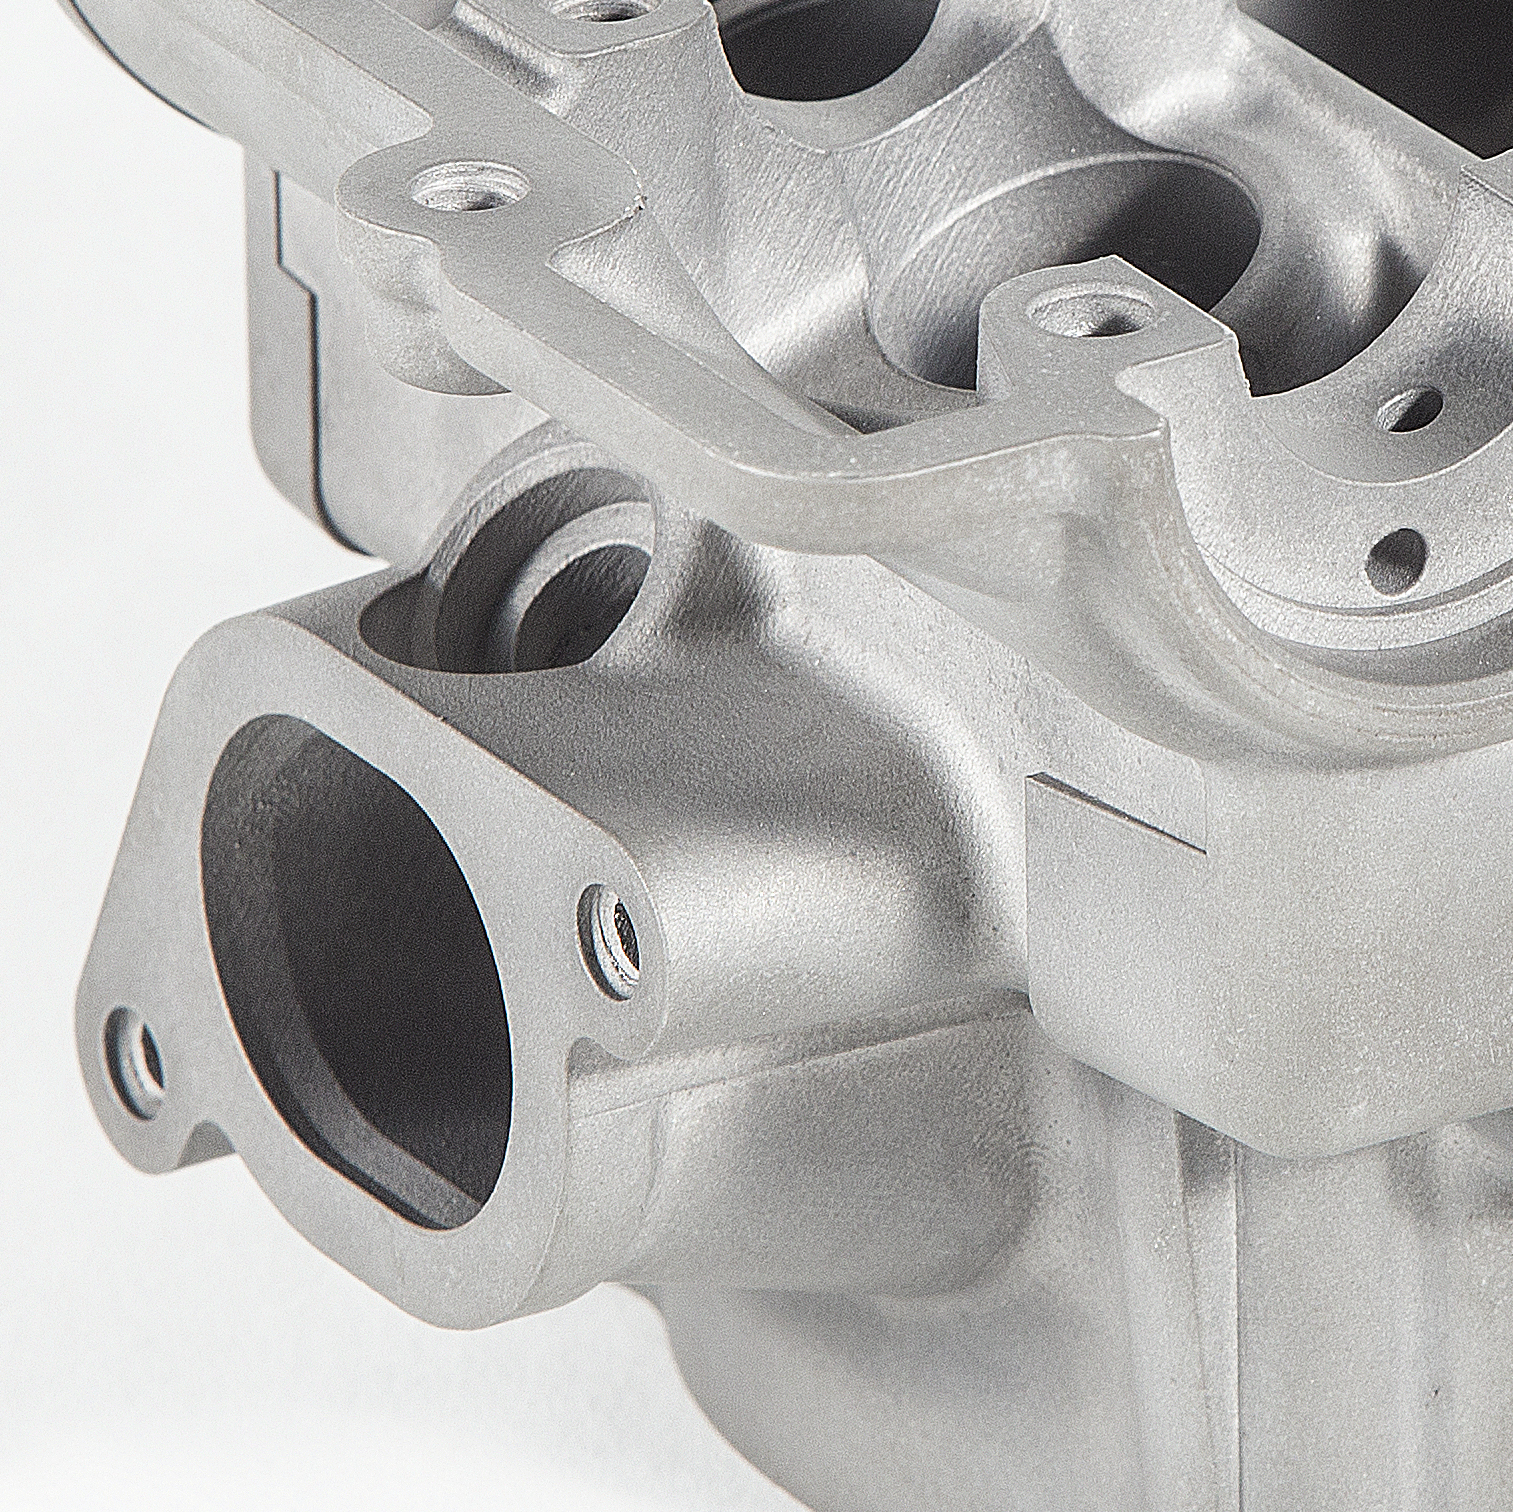 cylinder head sample, 3d metal printer